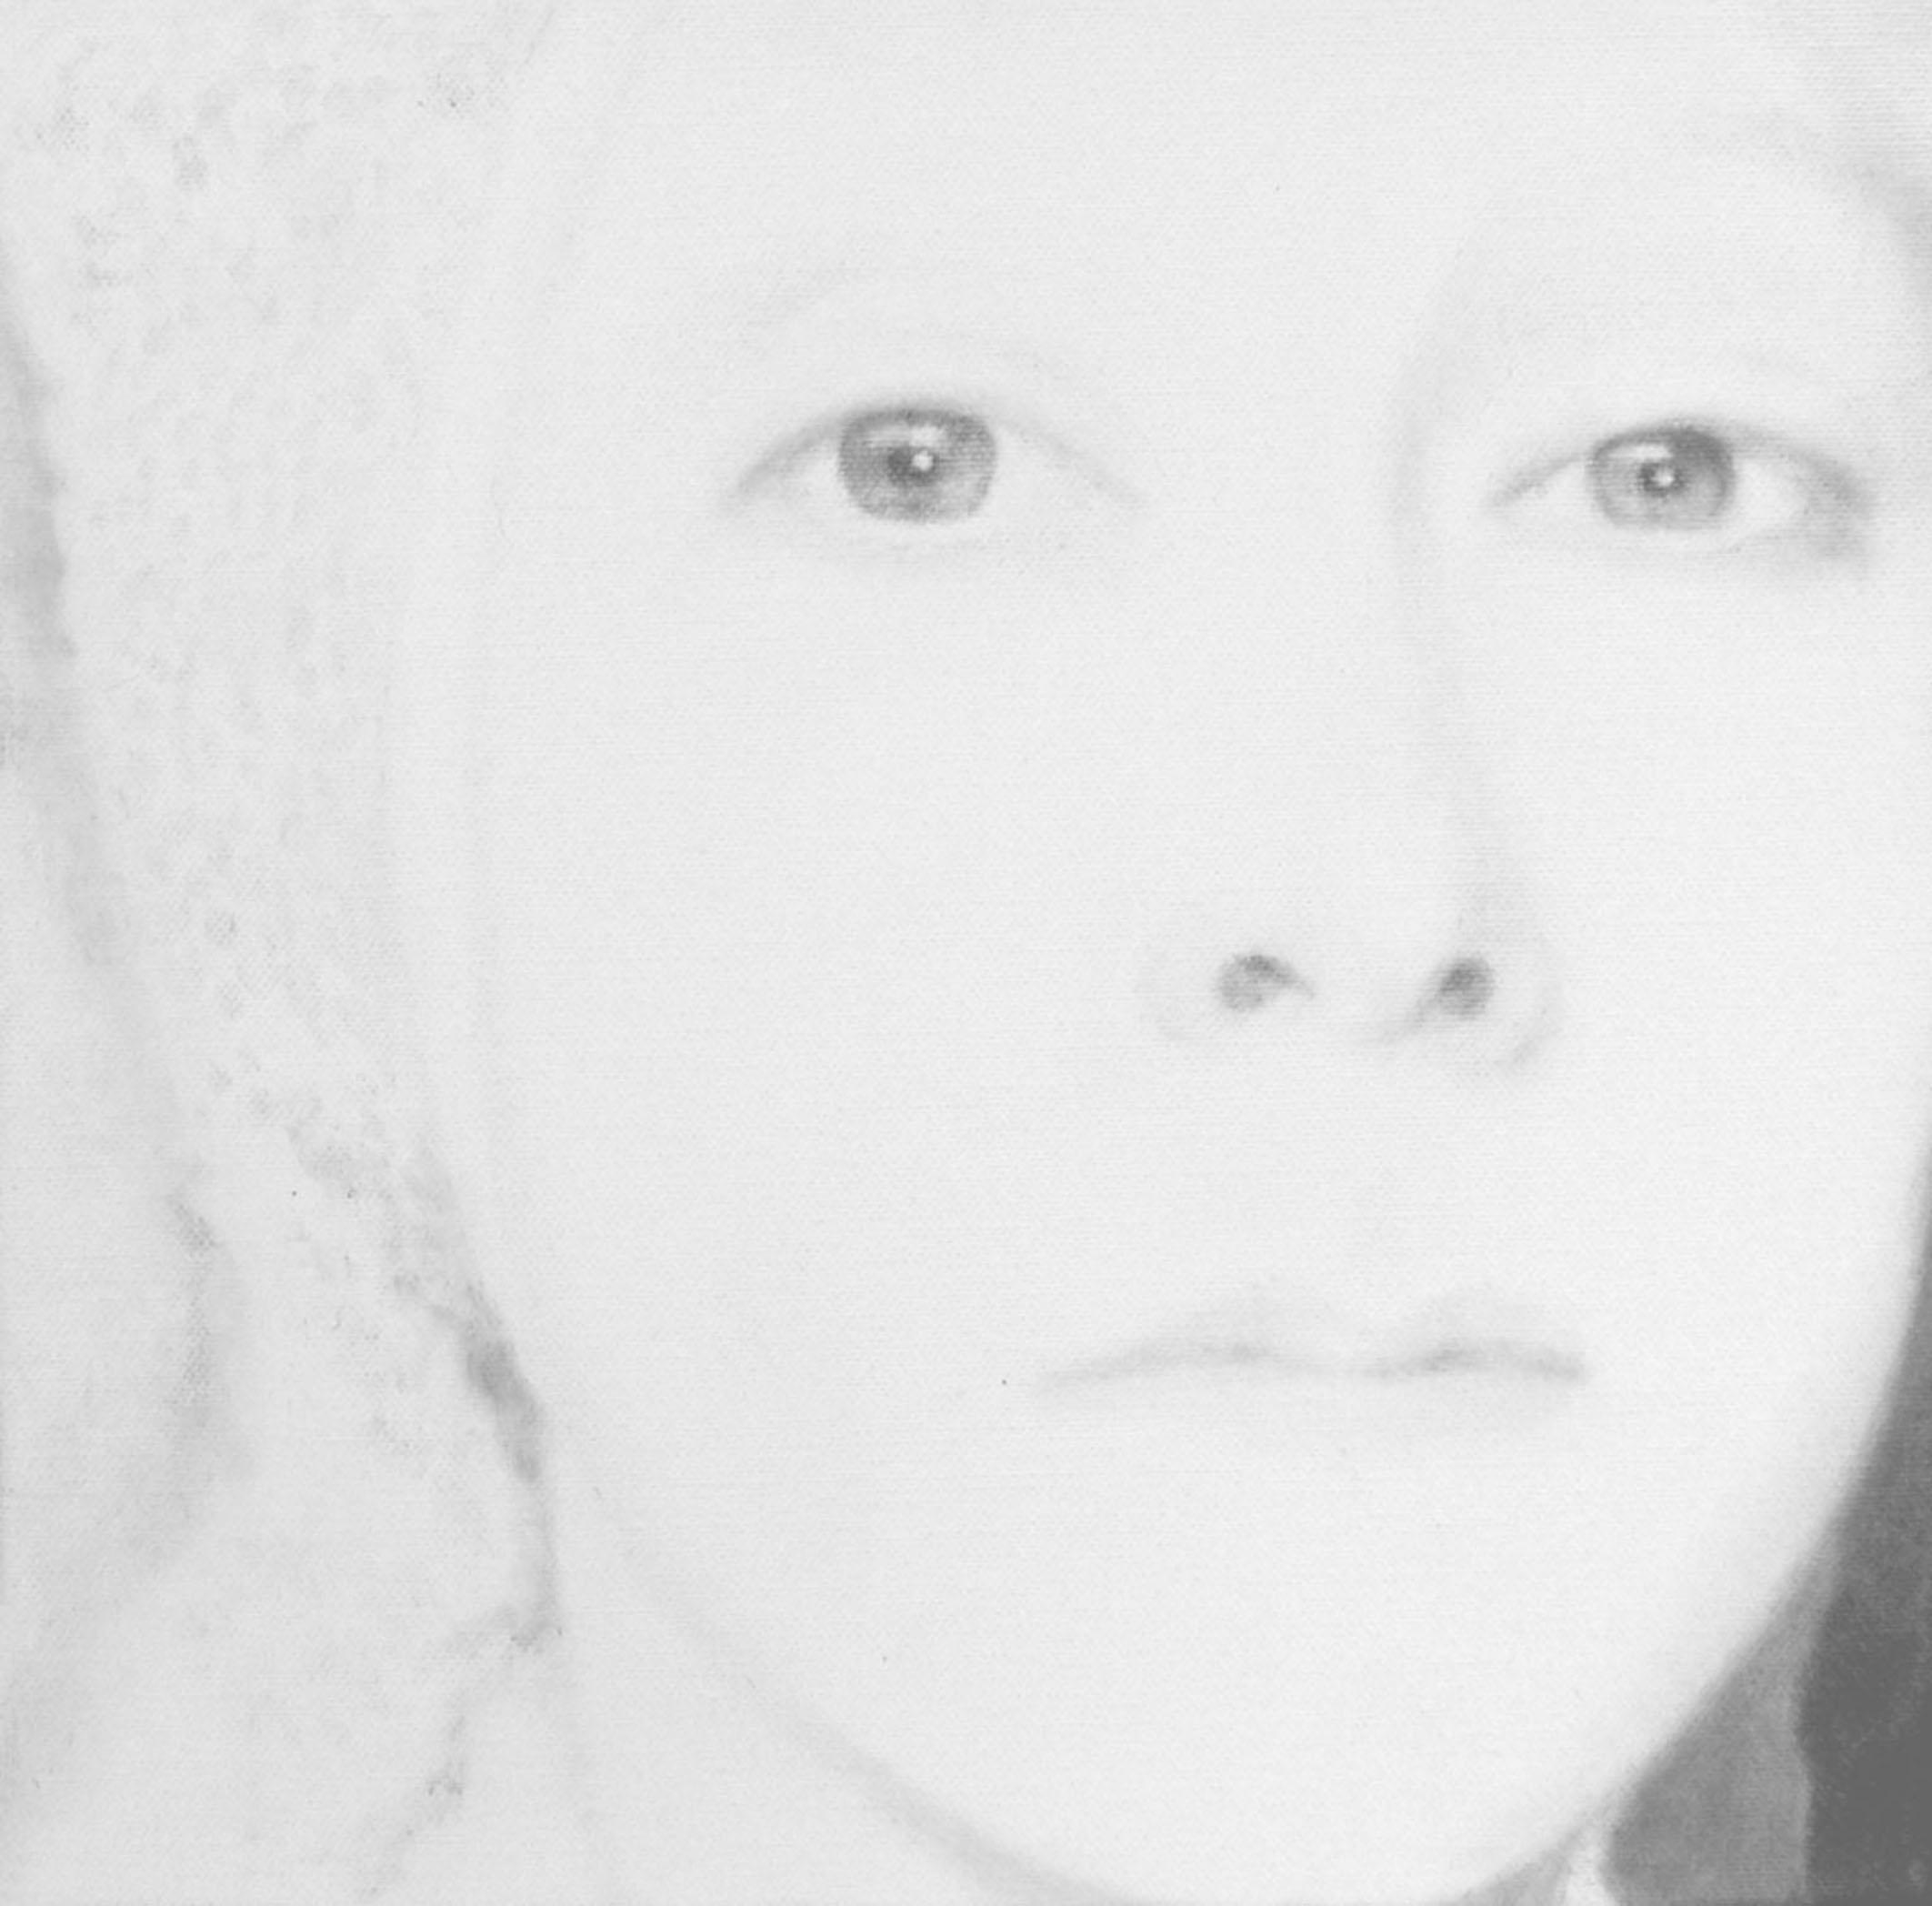 Lique Schoot, Self-portrait 08 03 31